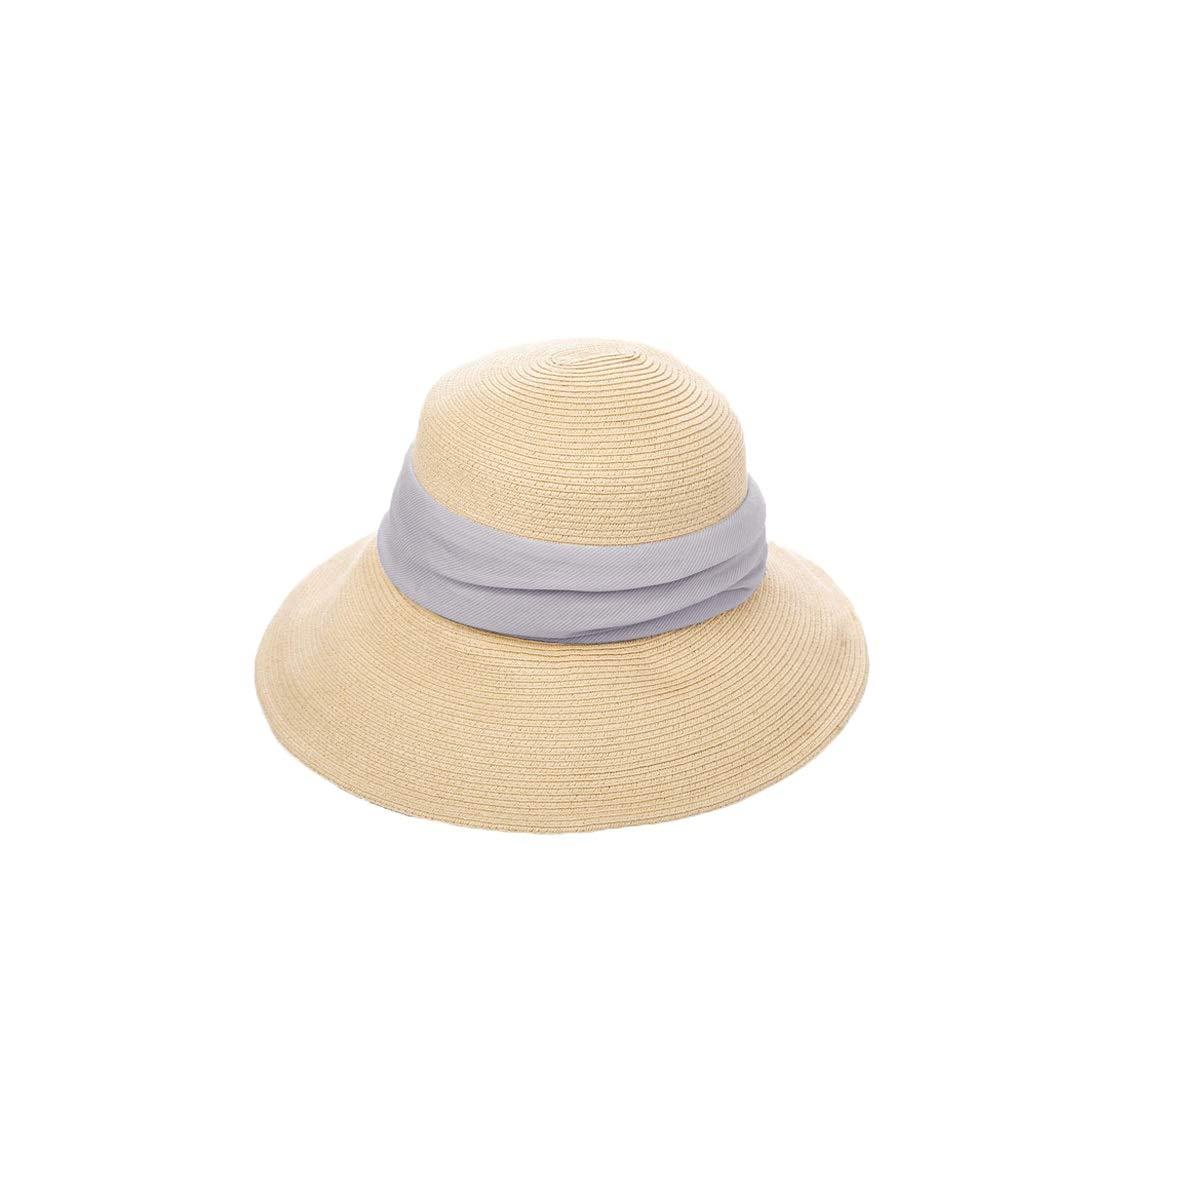 Zhongyue Hat Female Summer Straw Hat Wild Hat Visor Foldable Big Sunscreen Travel Beach Sun Hat, Beige, Dark Blue Summer hat (Color : Beige)